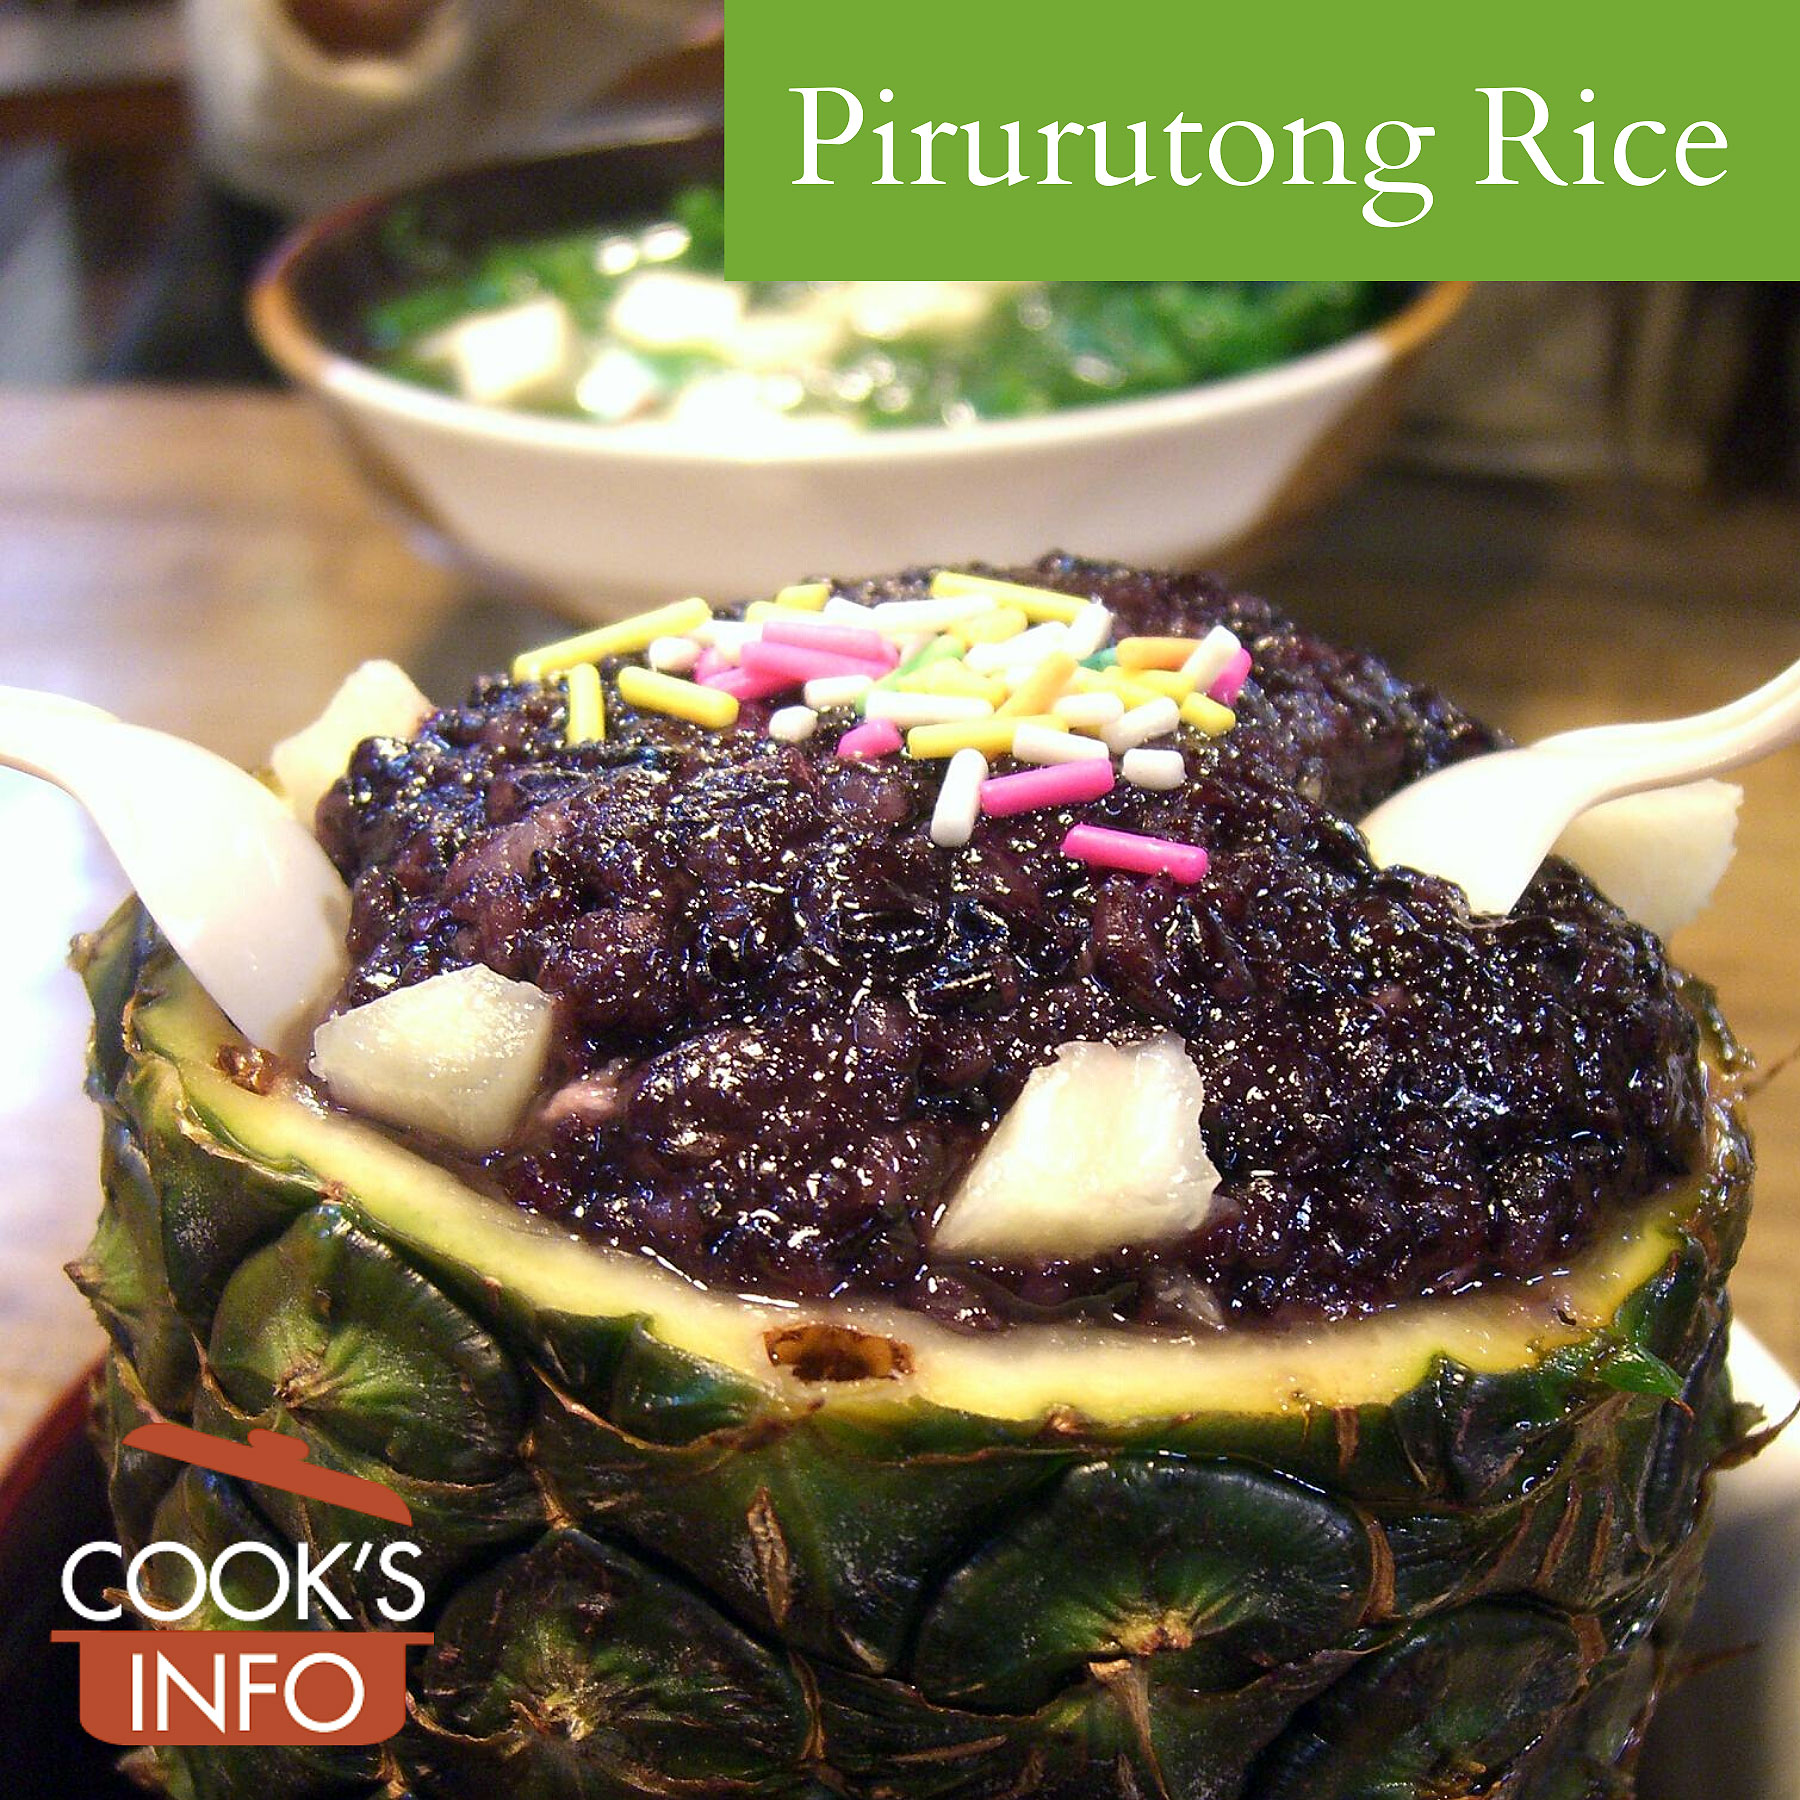 Purple / Black Glutinous Rice